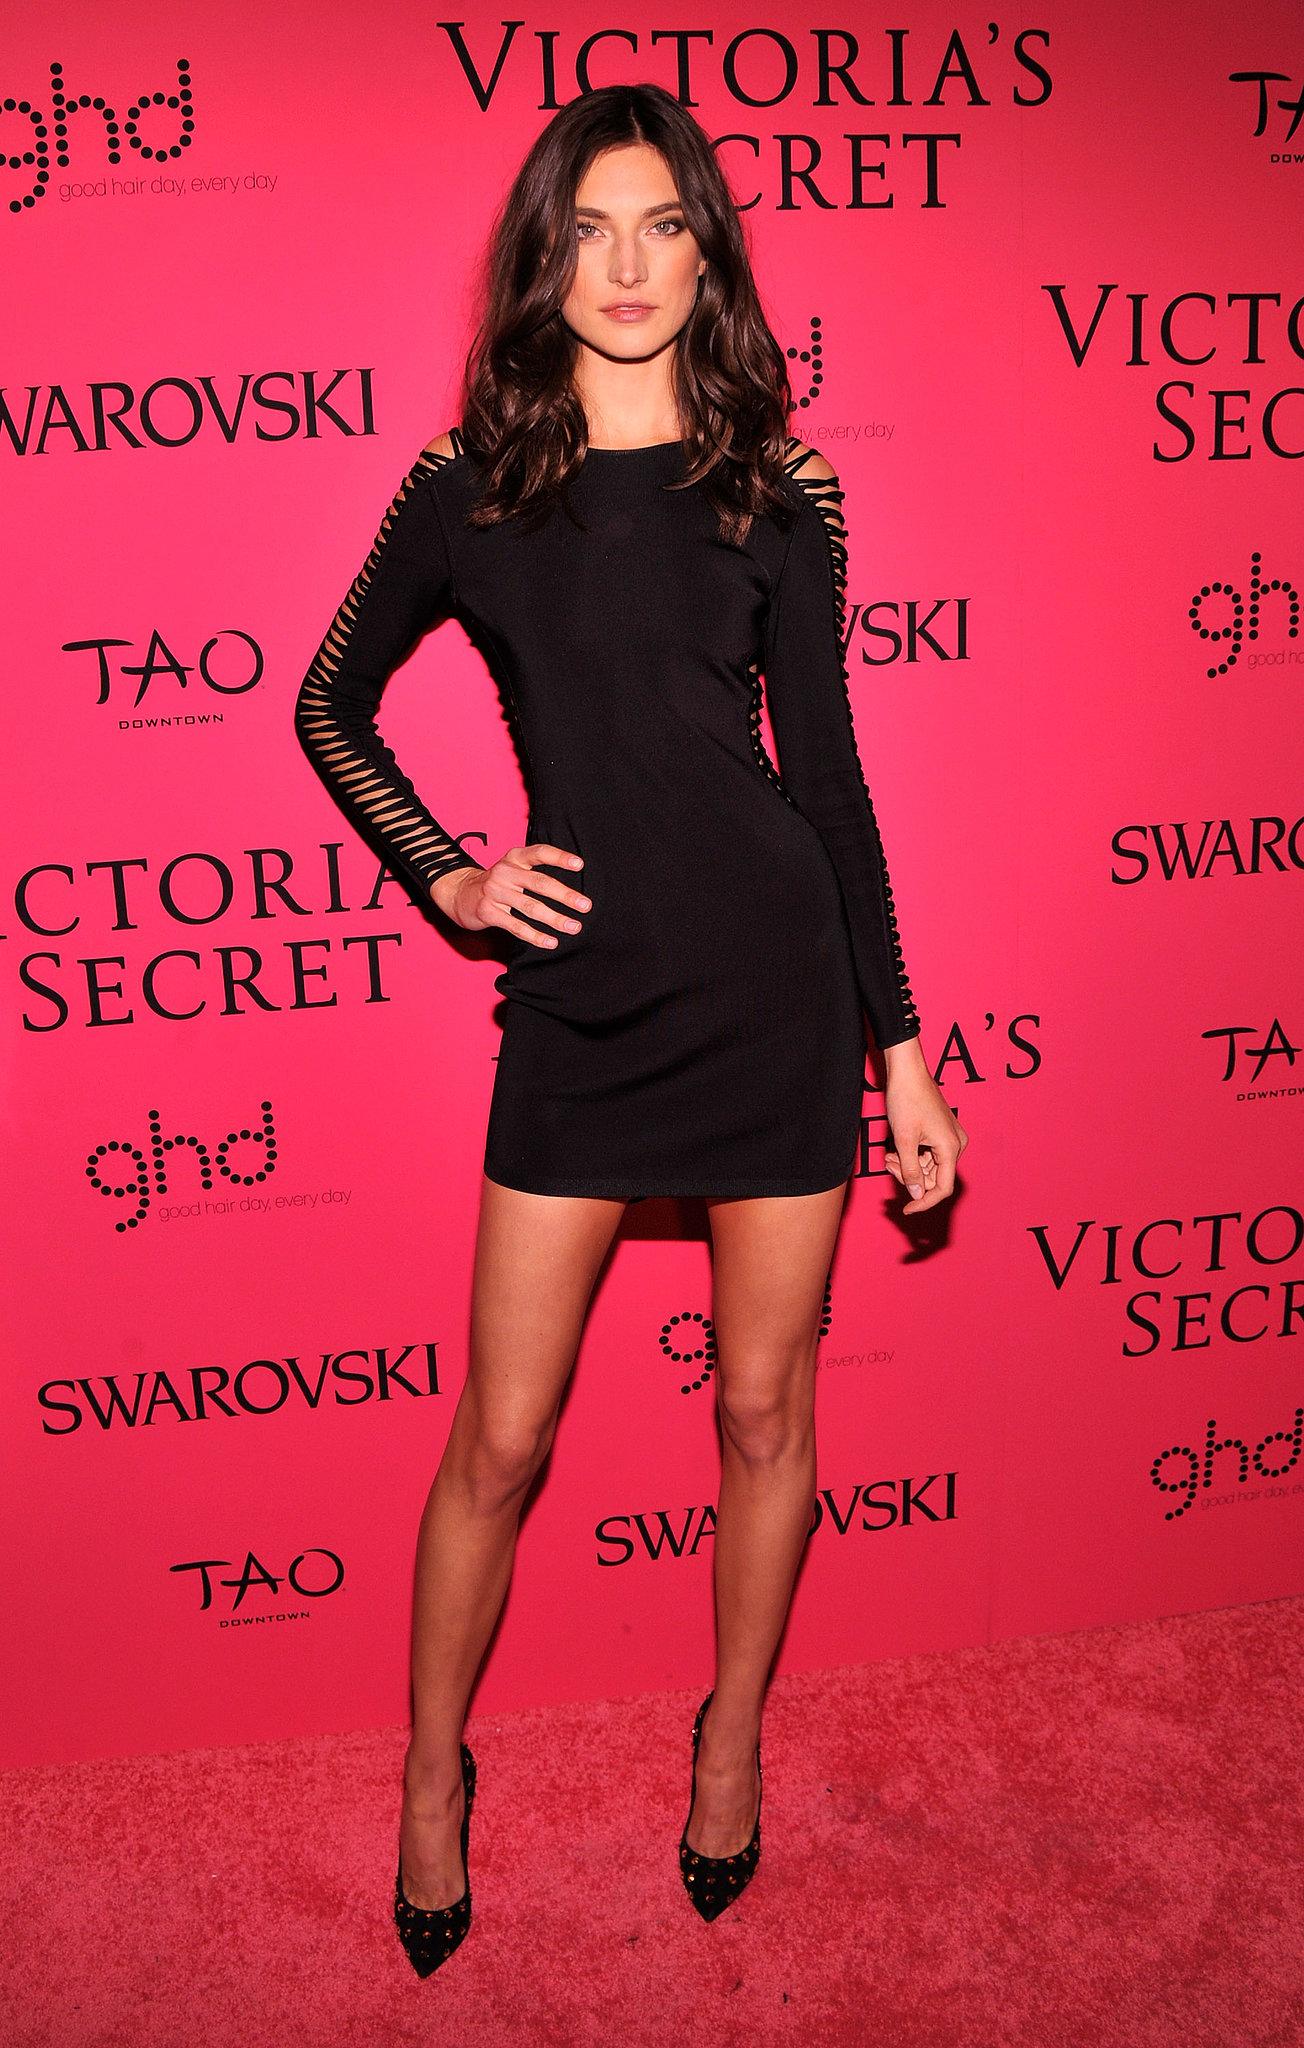 Jacquelyn Jablonski at the Victoria's Secret Fashion Show.